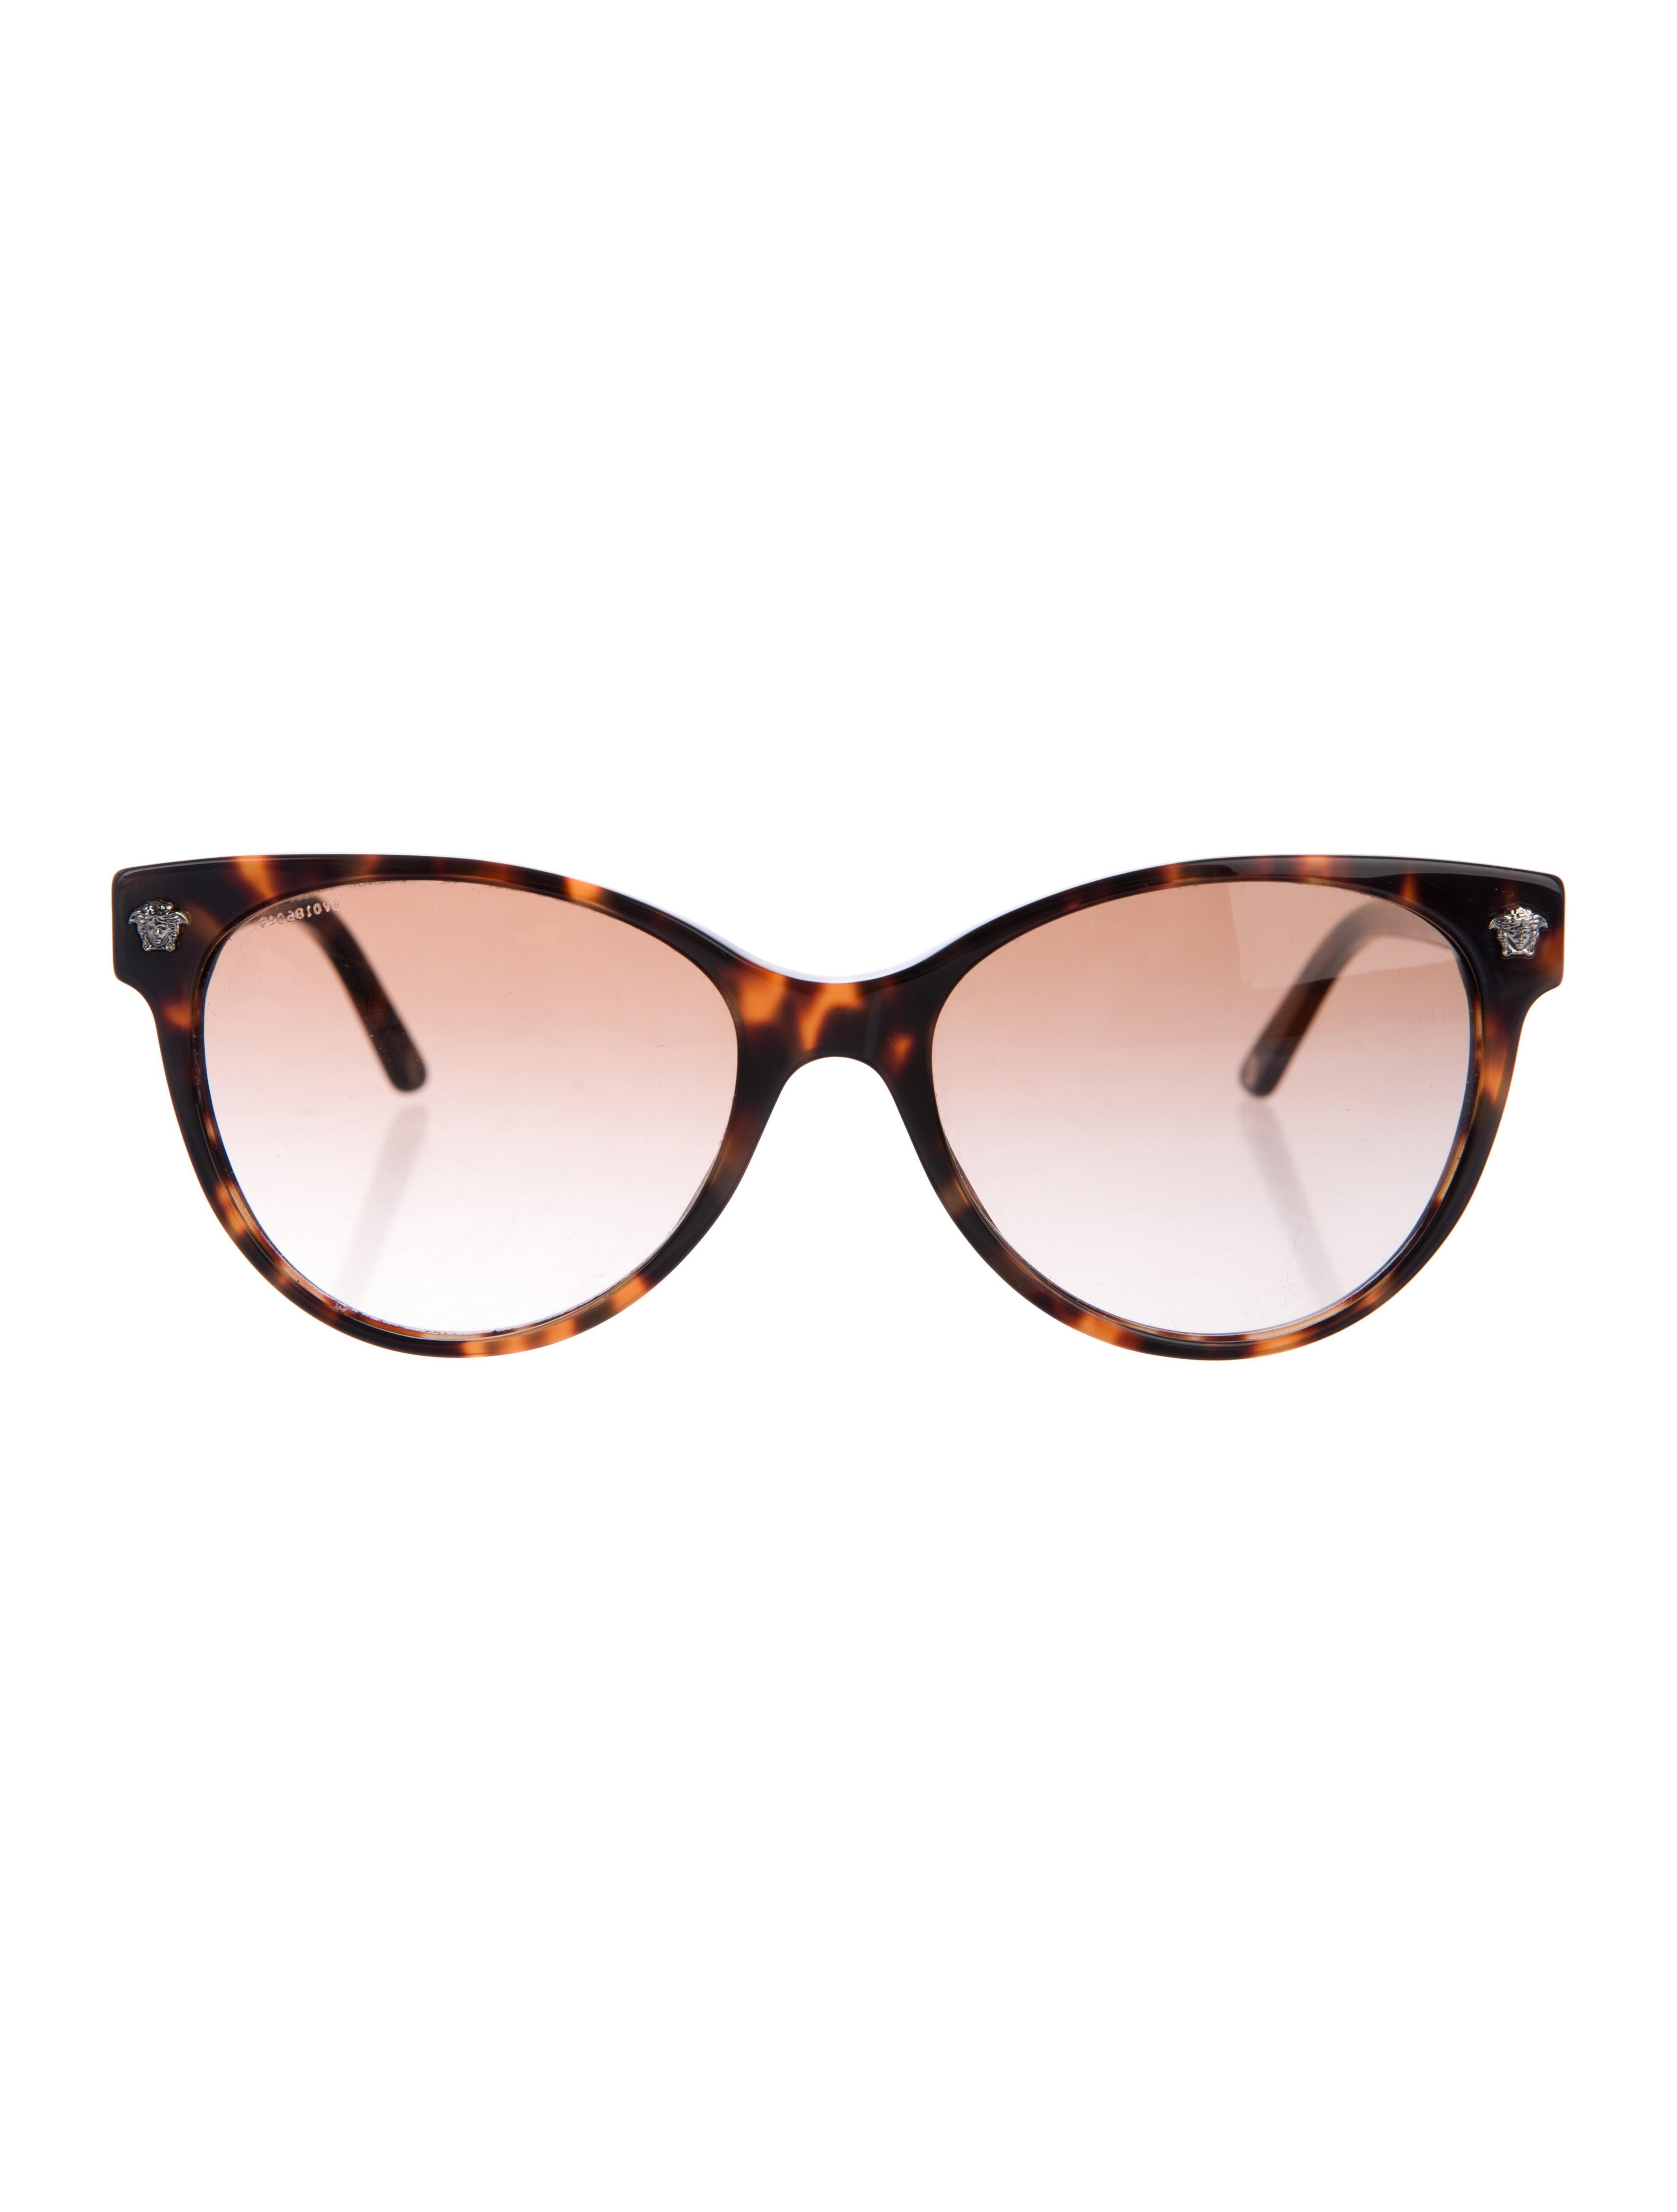 24c180253b61 Versace Cat Eye Sunglasses With Leather Trim